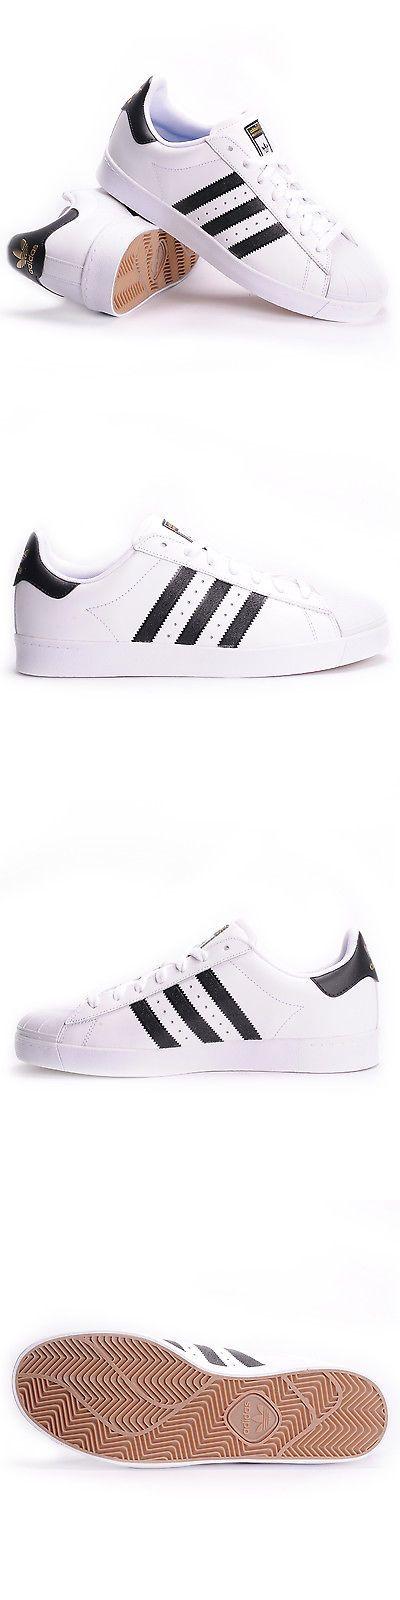 Men Shoes: Adidas Superstar Vulc Adv (White Core Black White) Men S Skate Shoes -> BUY IT NOW ONLY: $59.99 on eBay!